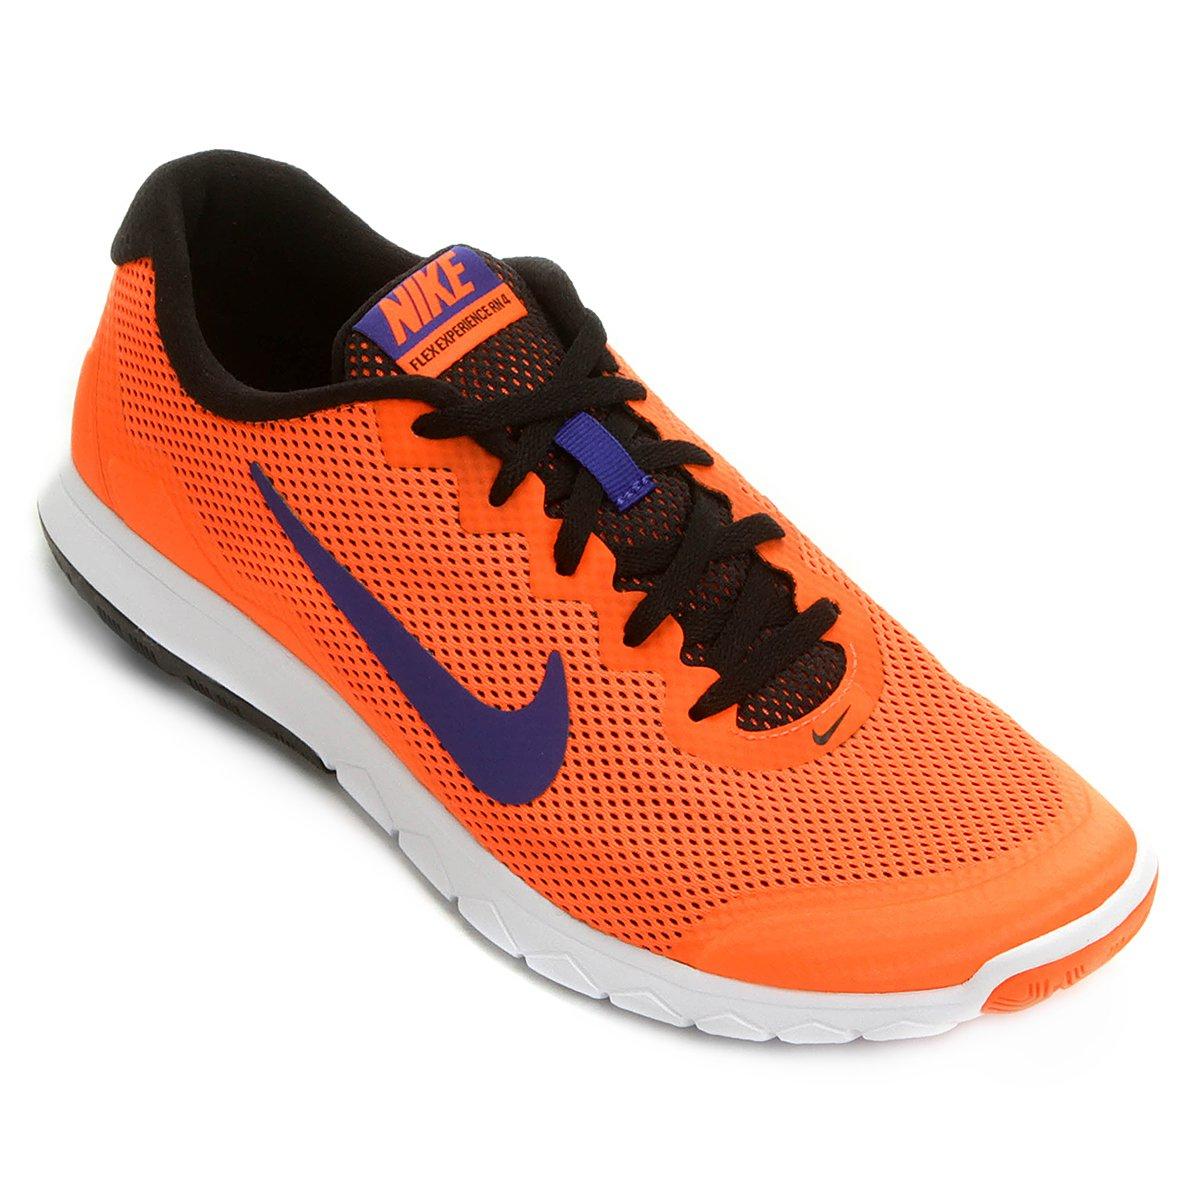 ef7a4ad3d33 Tênis Nike Flex Experience RN 4 Masculino - Compre Agora